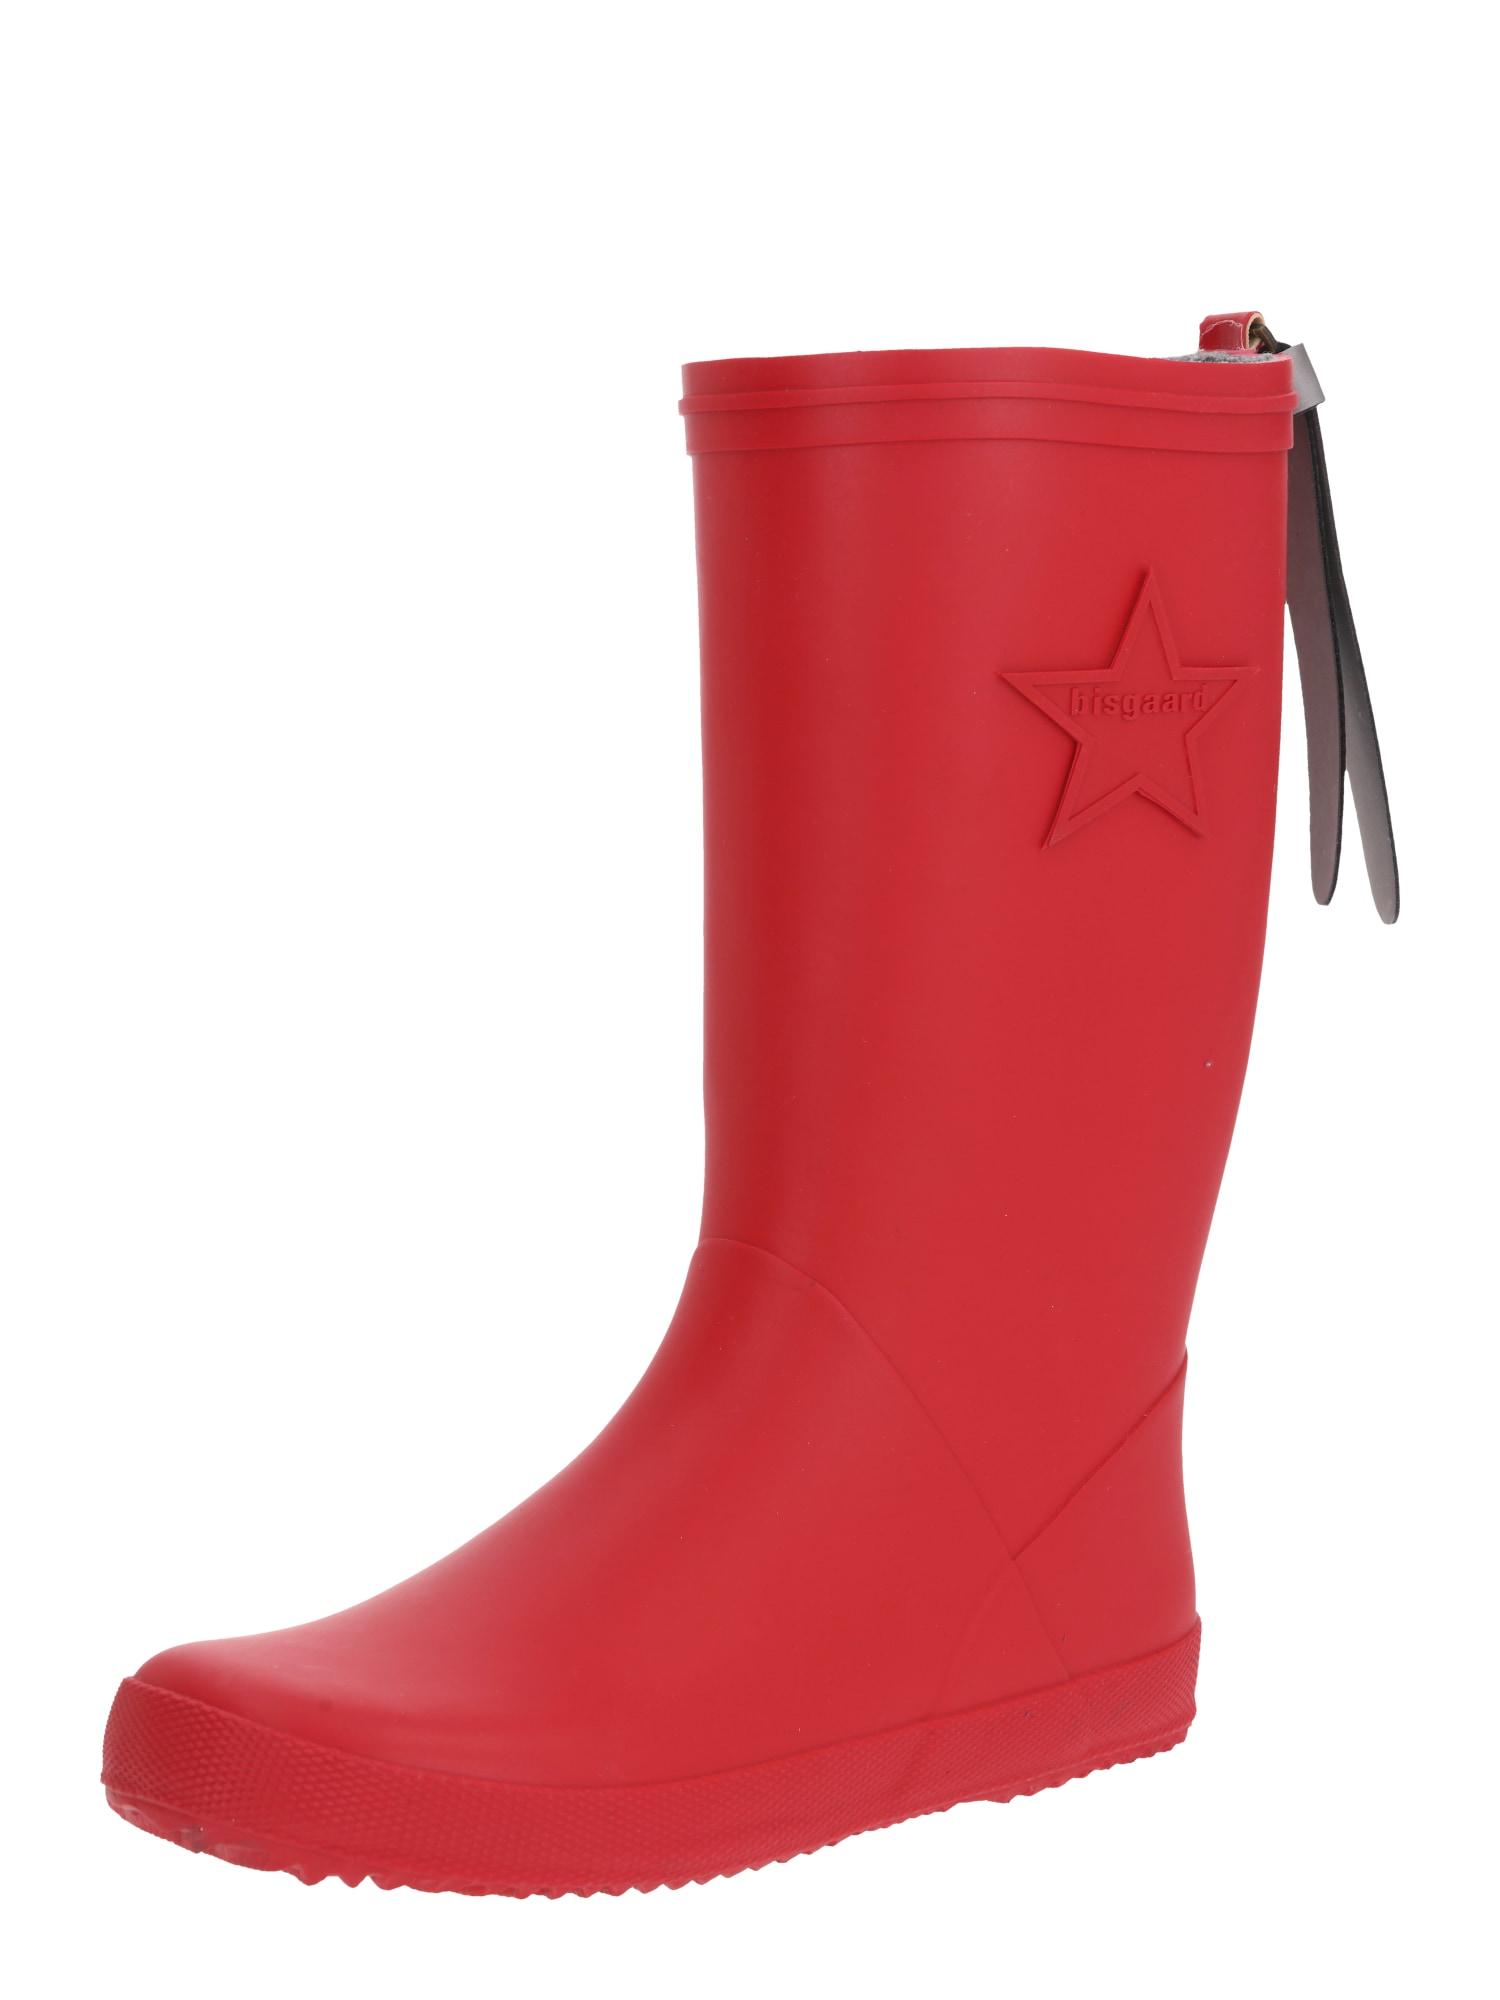 BISGAARD Guminiai batai raudona